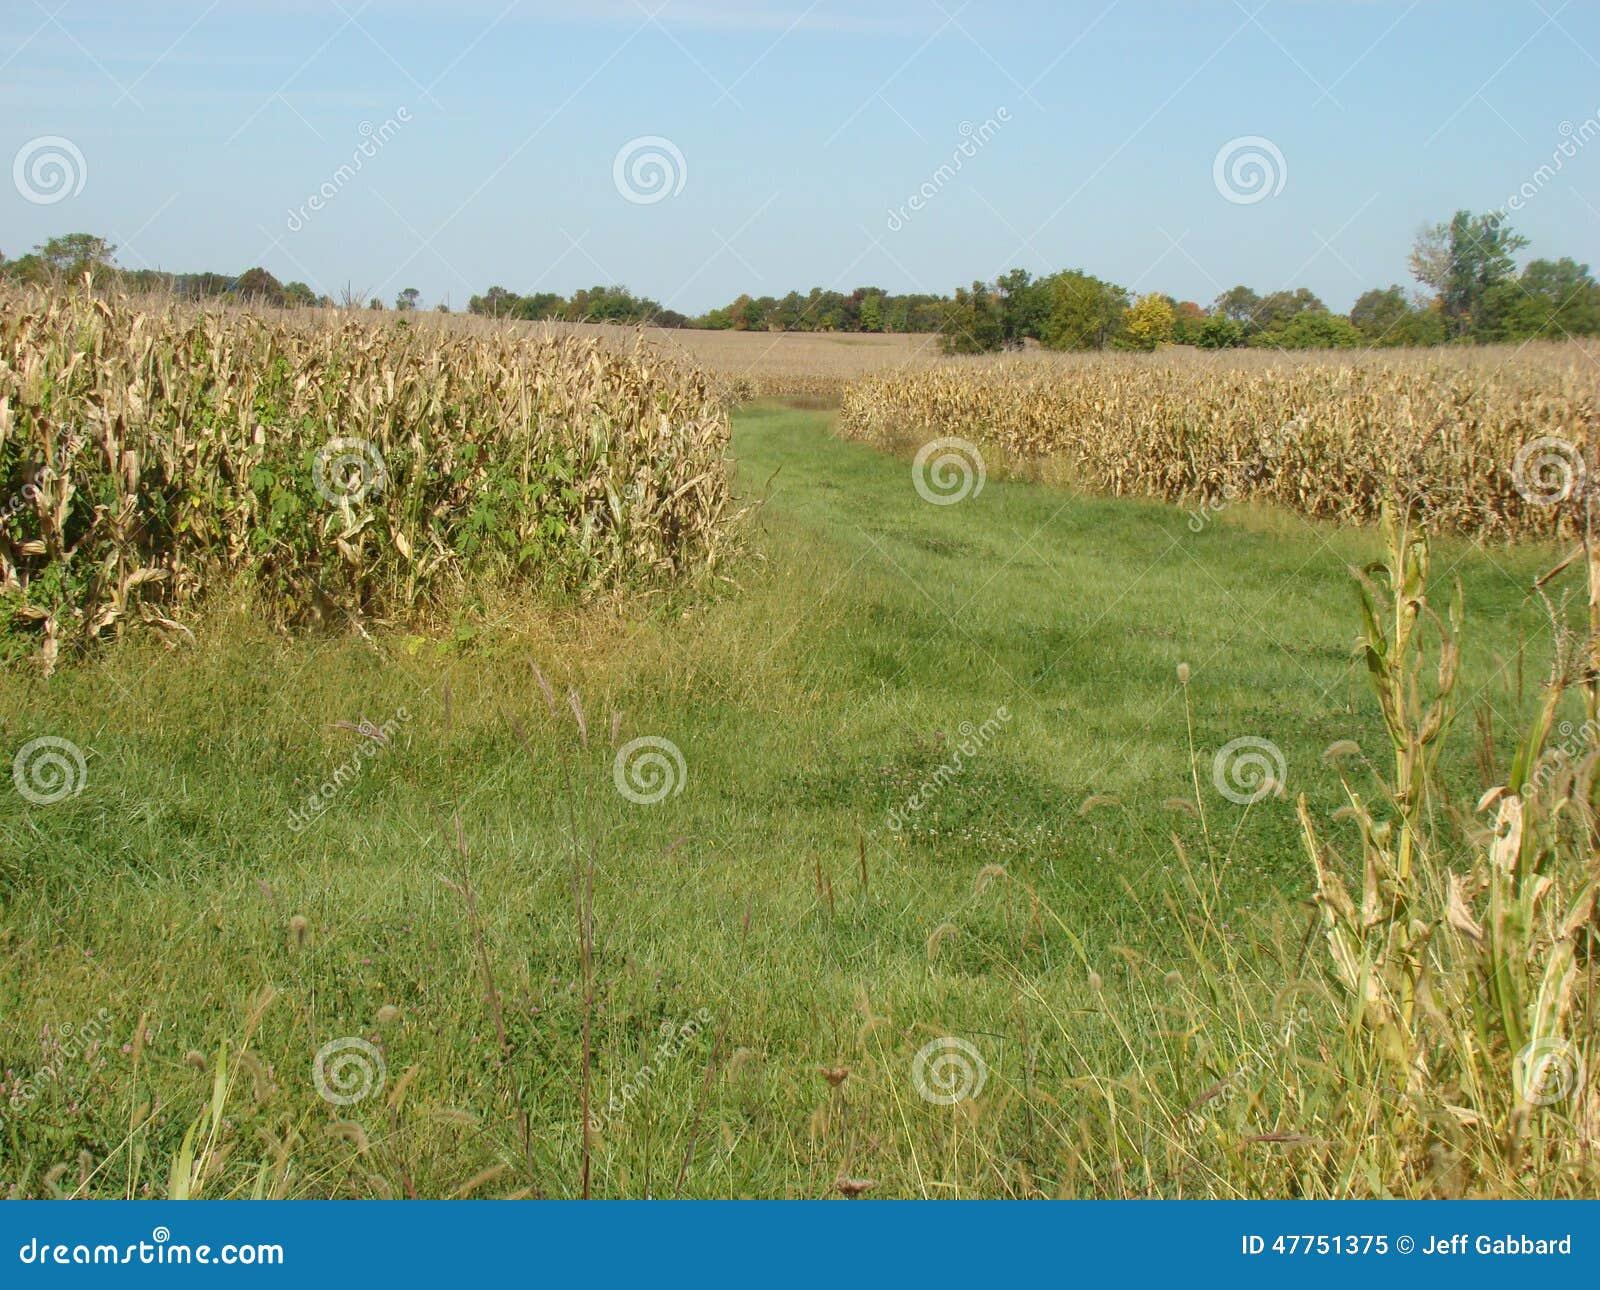 Path between corn fields